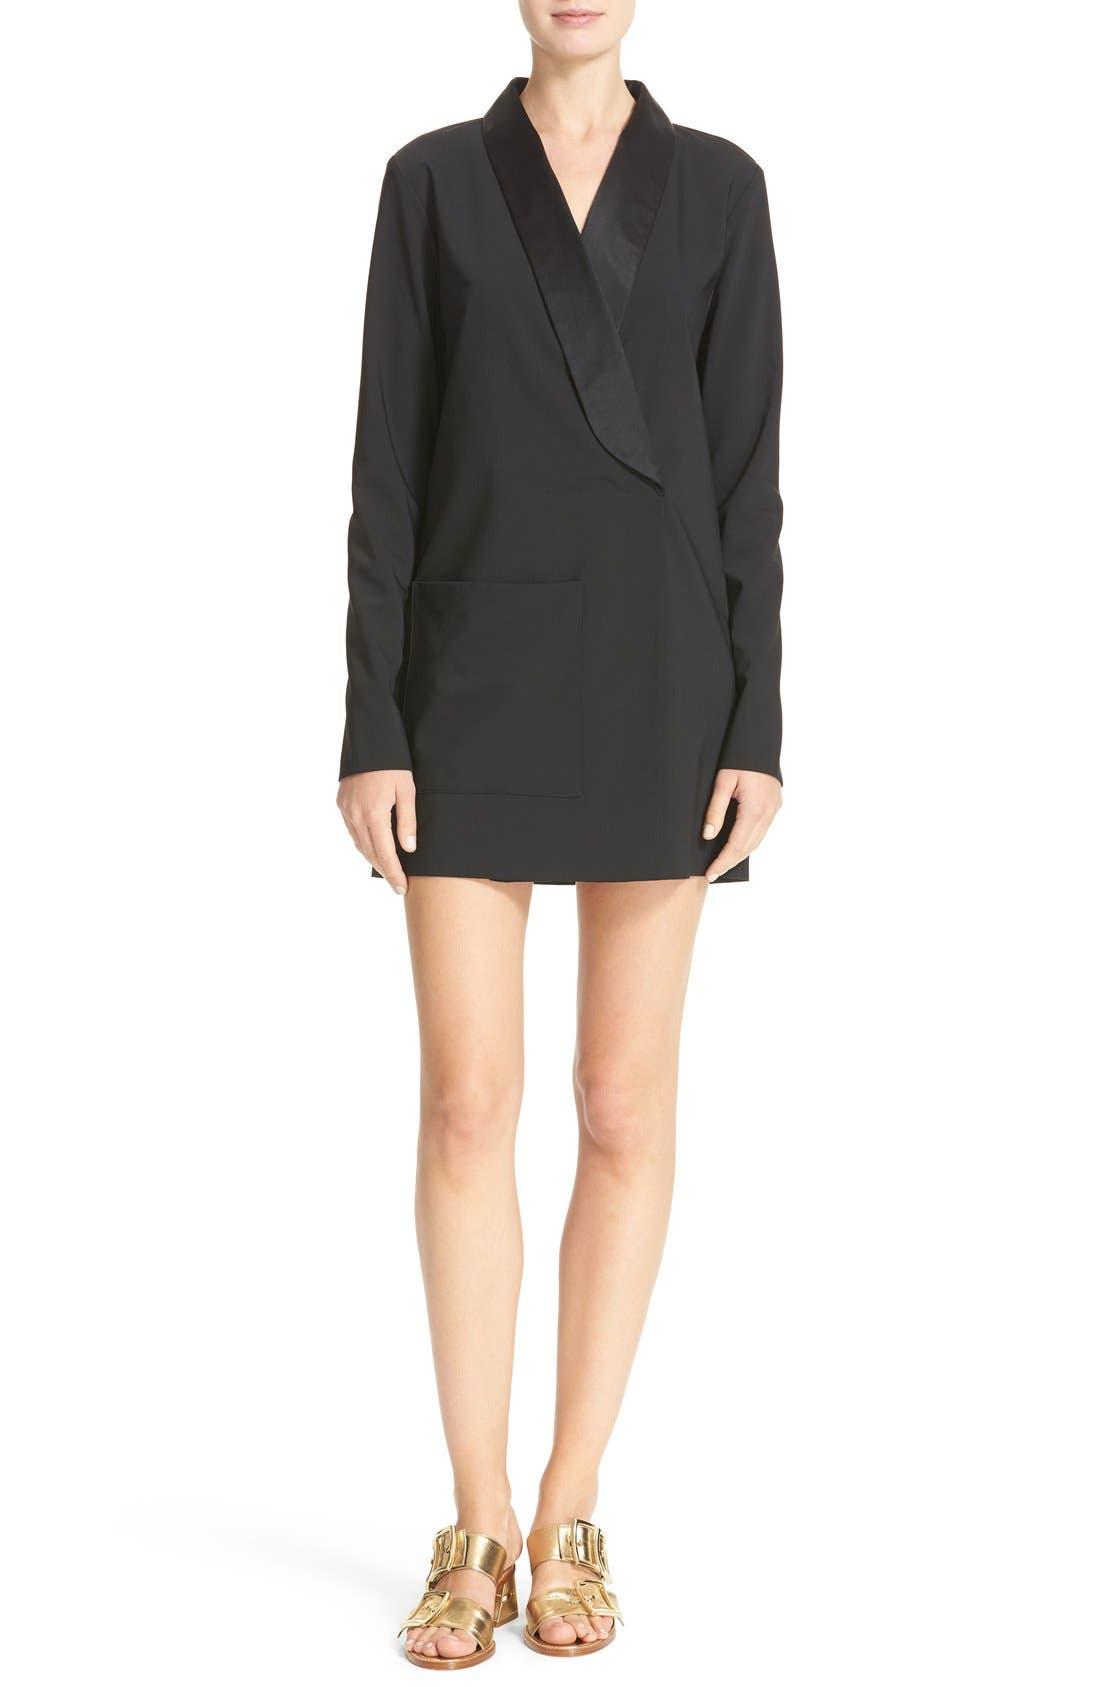 Alternate Image 1 Selected - Tibi Satin Lapel Tuxedo Dress